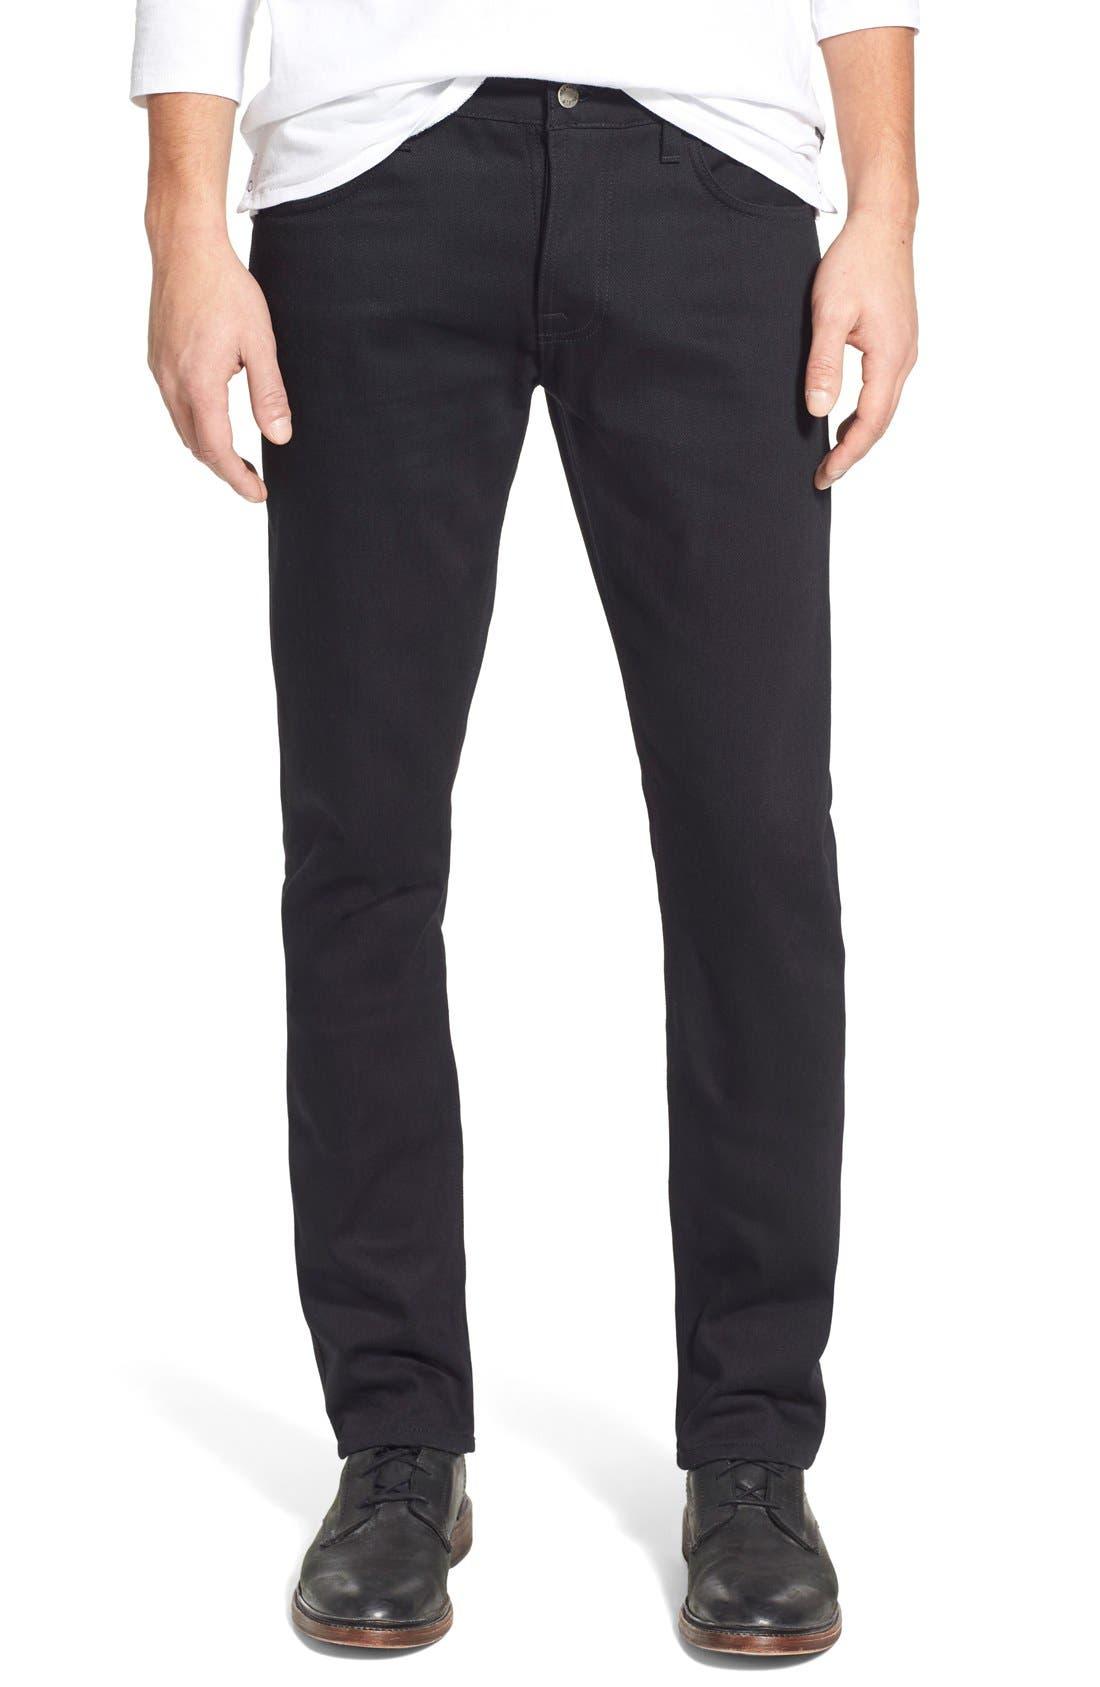 NUDIE JEANS,                             'Grim Tim' Slim Fit Raw Selvedge Jeans,                             Main thumbnail 1, color,                             001